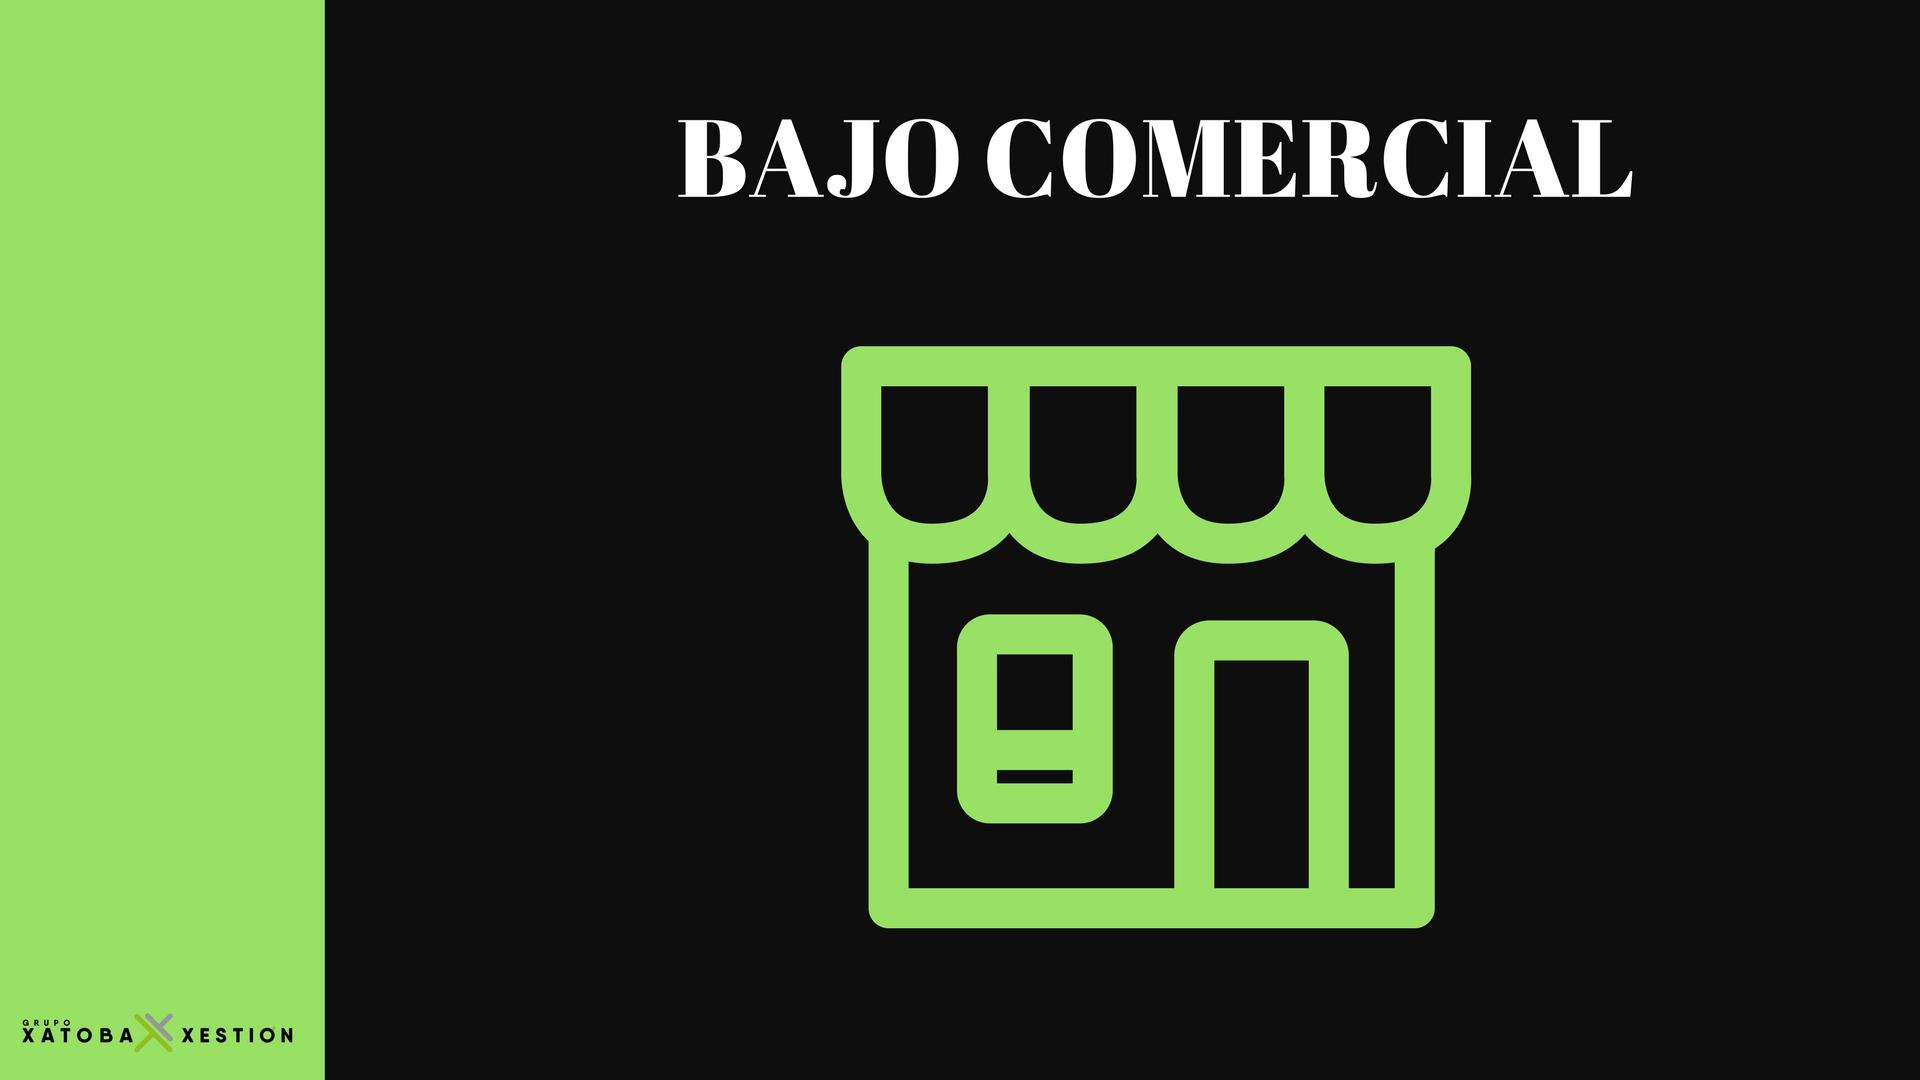 Amplio local comercial, ideal para inversión – en centro de Lugo